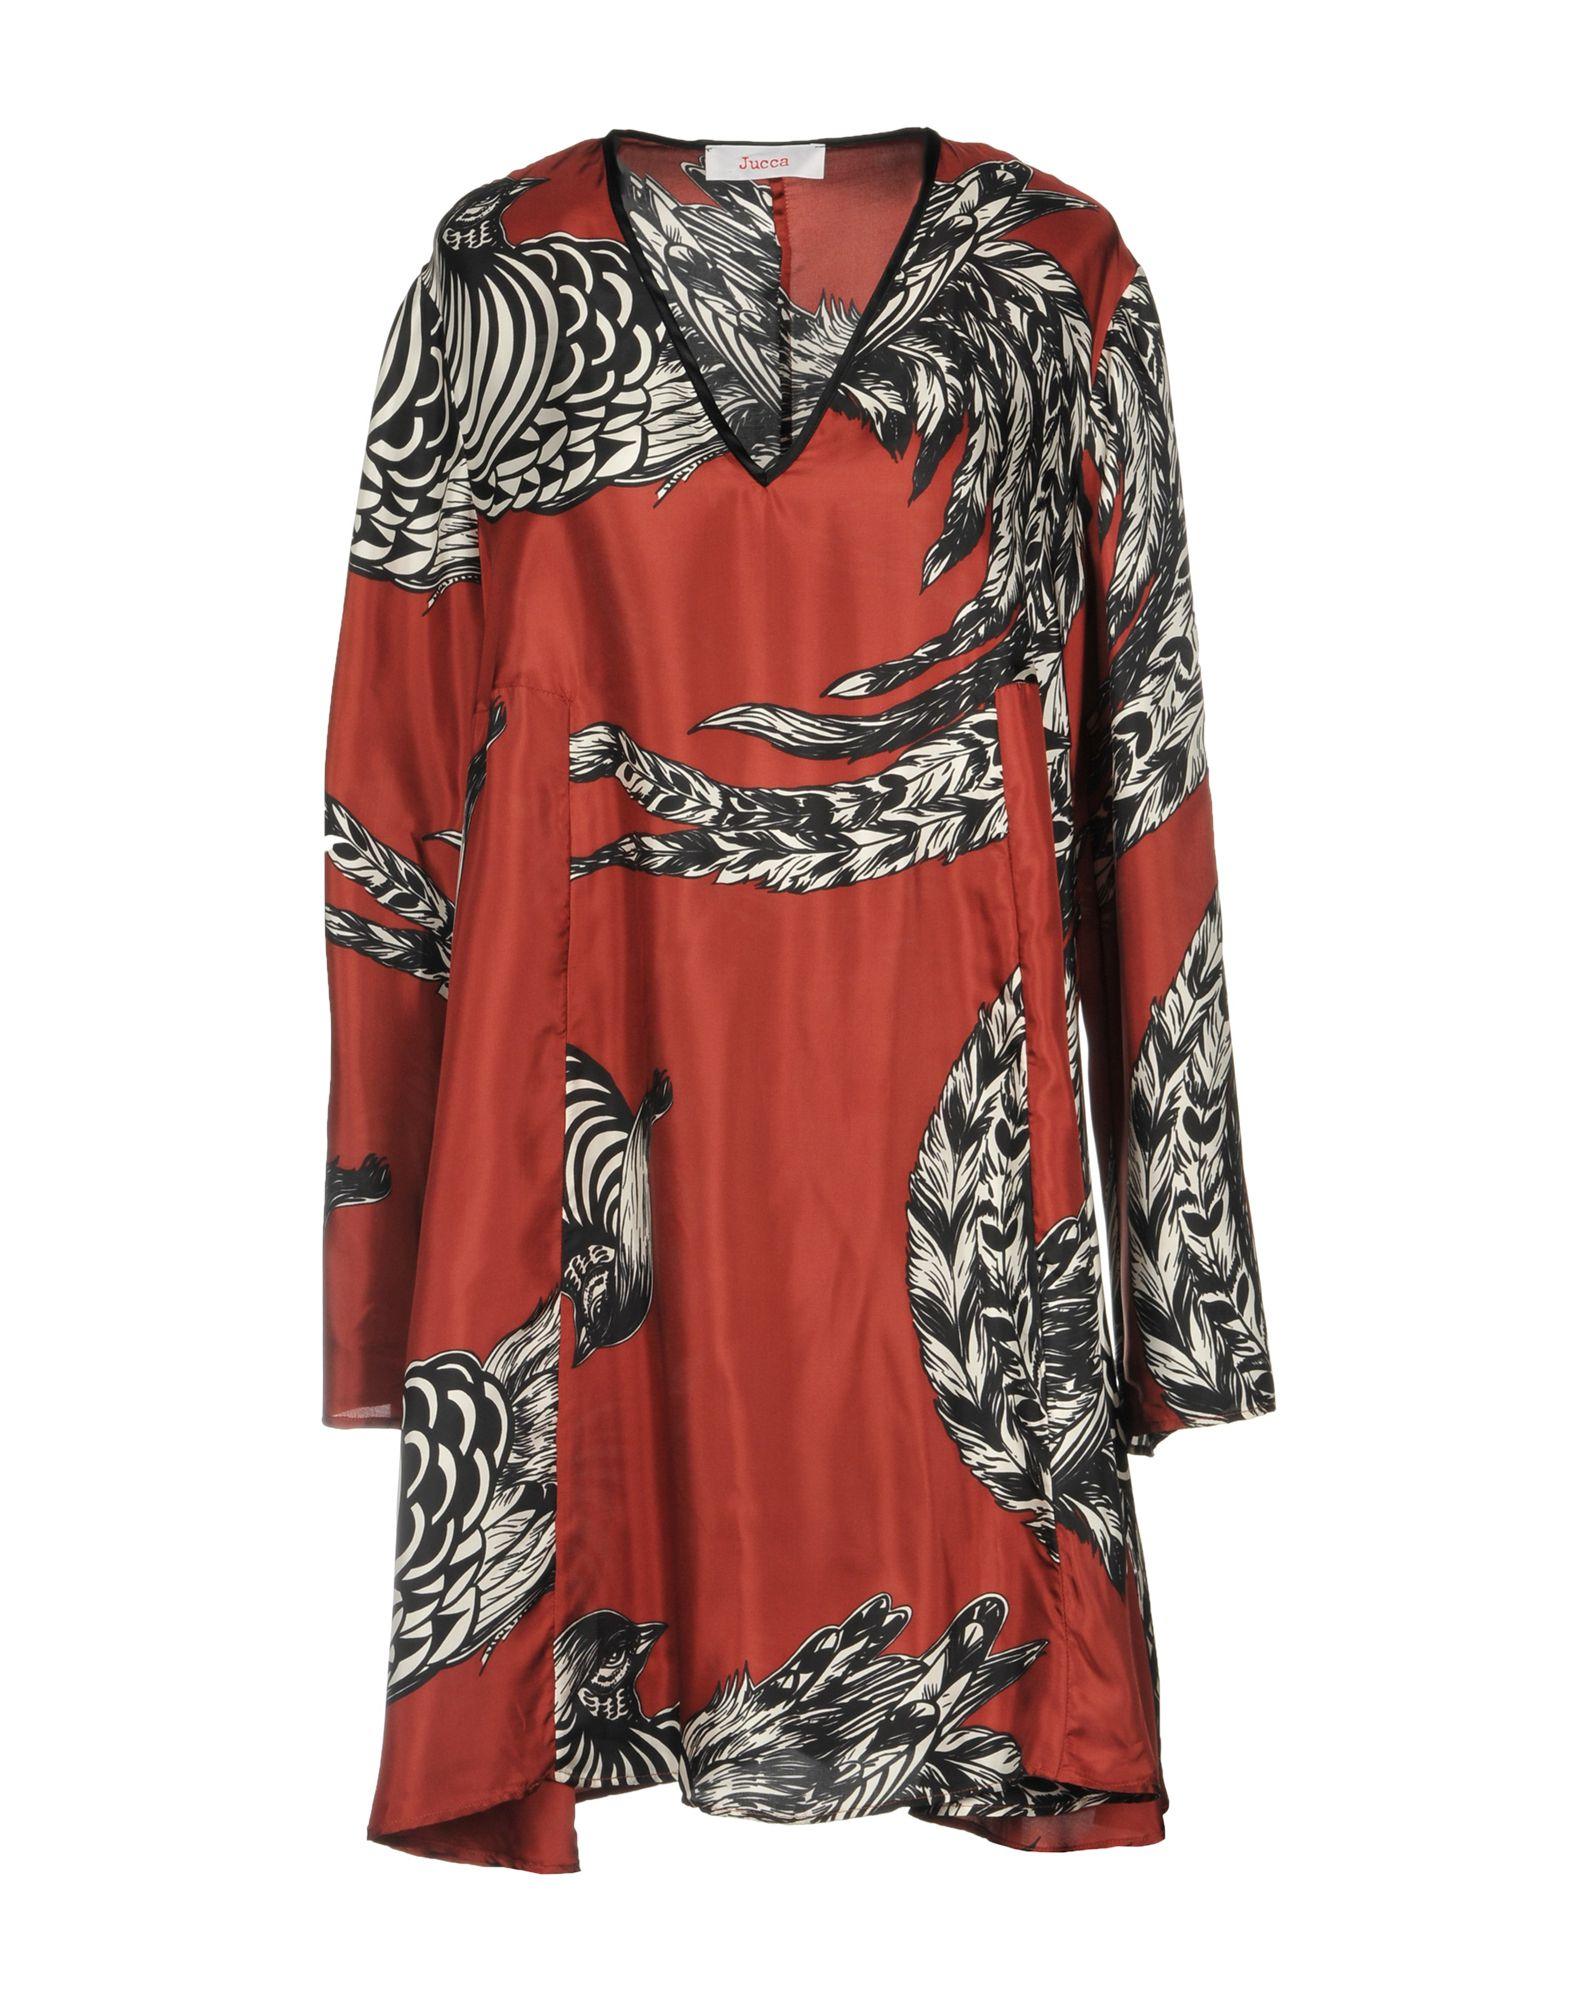 JUCCA Short Dress in Brick Red